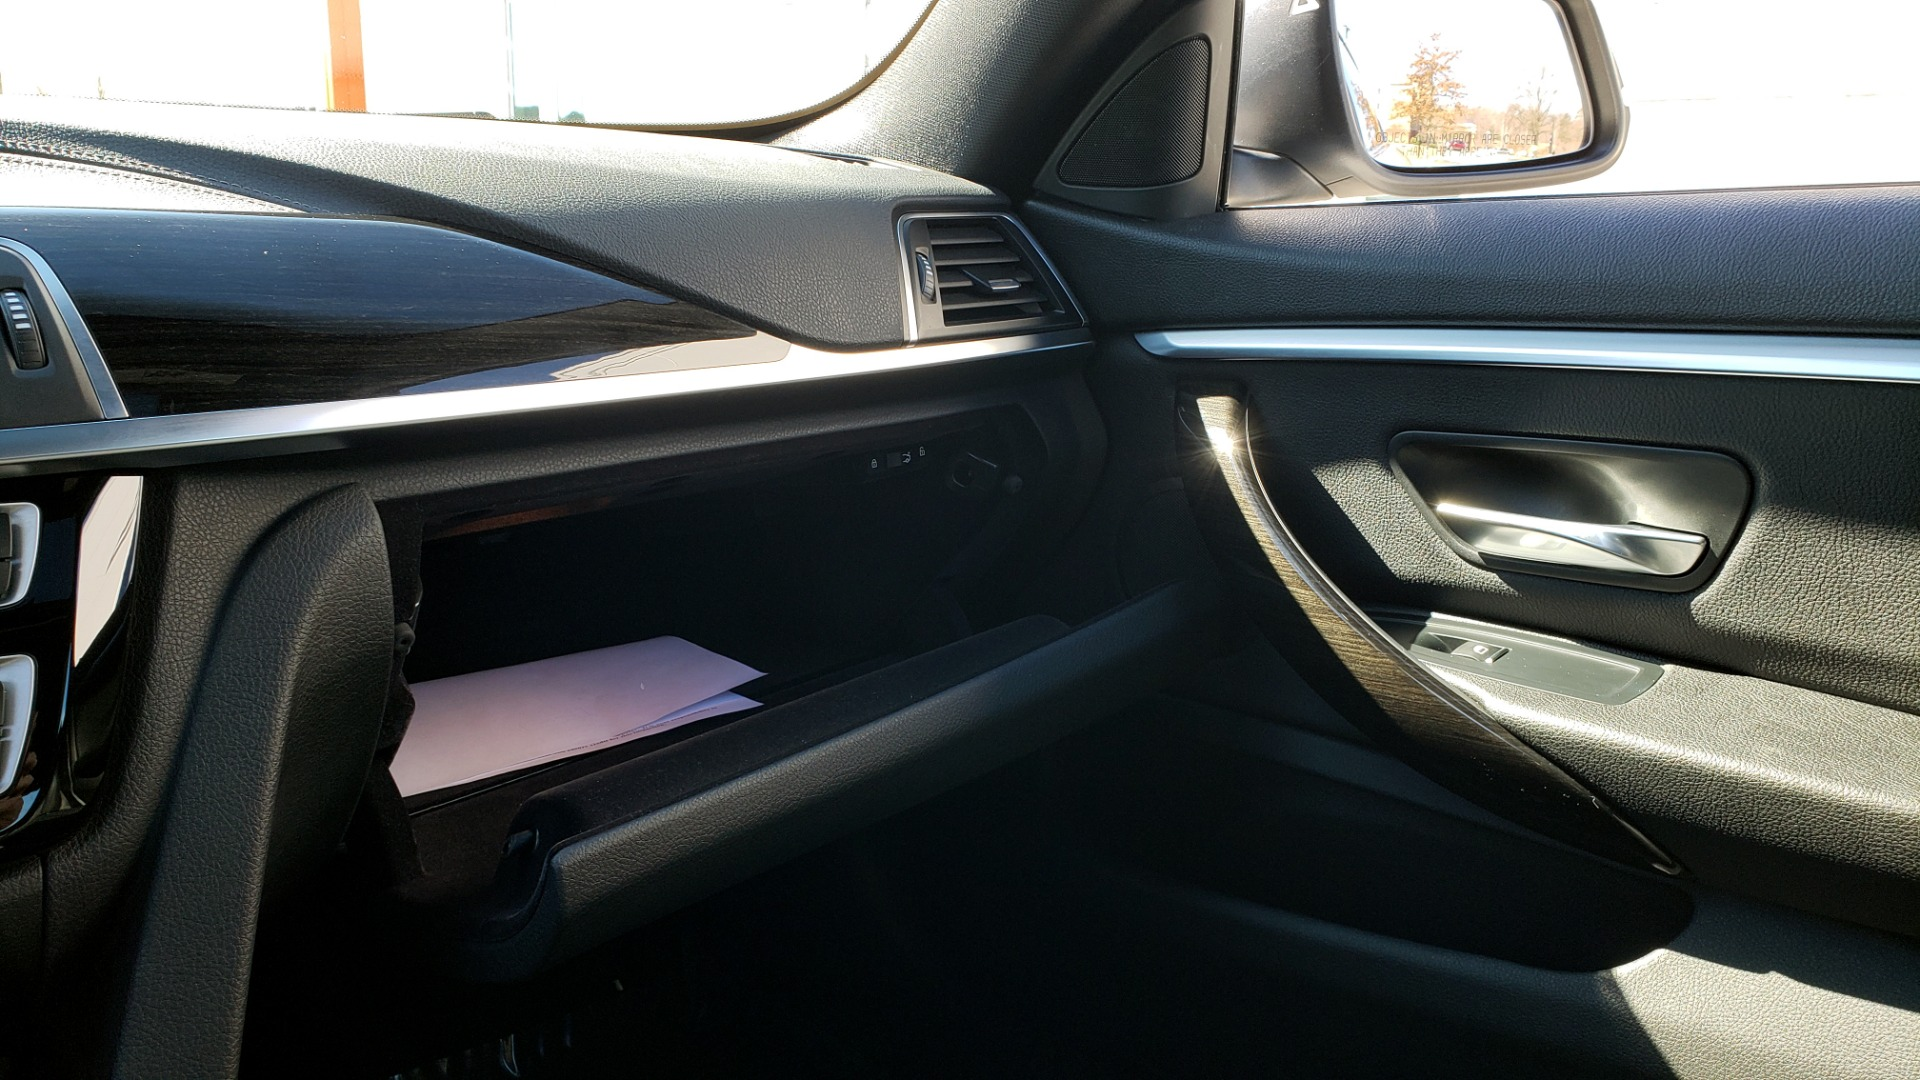 Used 2018 BMW 4 SERIES 430IXDRIVE / PREMIUM / NAV / SUNROOF / ESSENTIALS PKG for sale $27,795 at Formula Imports in Charlotte NC 28227 53